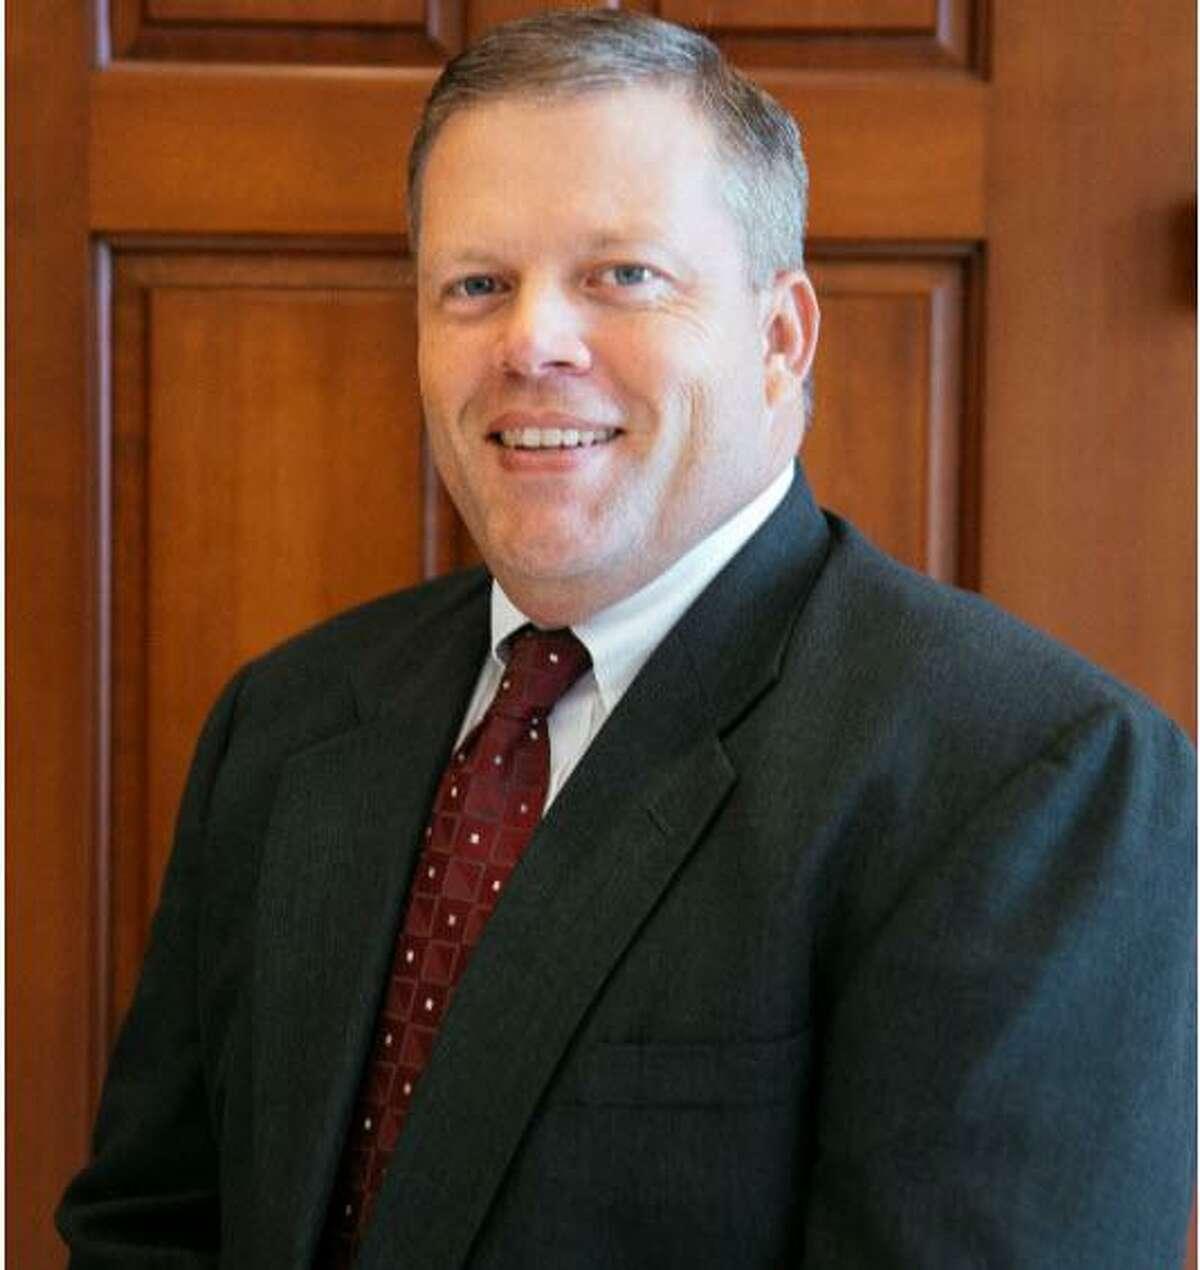 Chris Steubing, Sugar Land assistant city manager